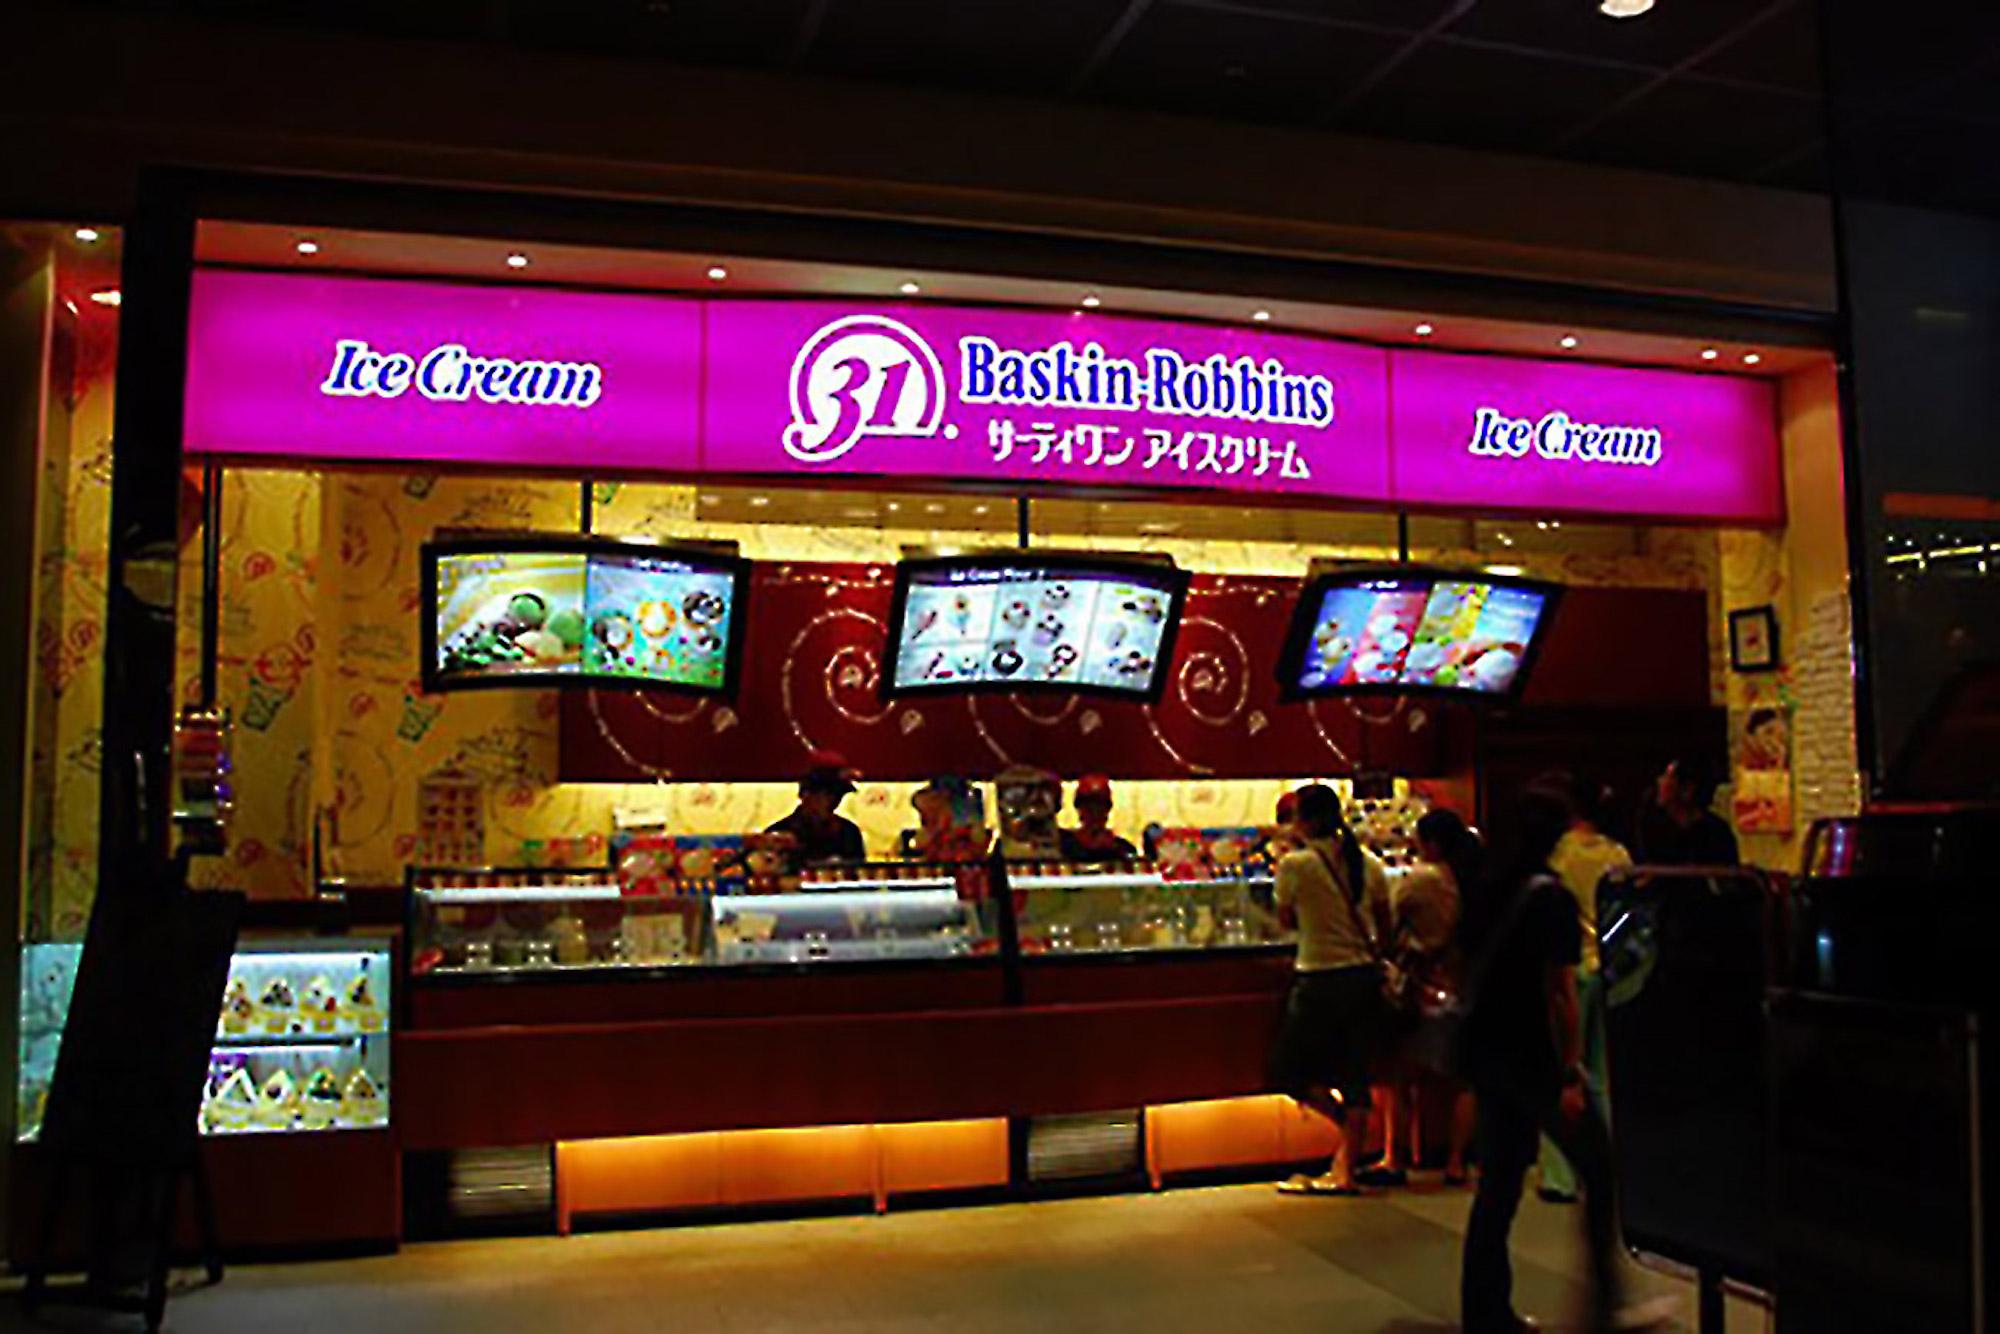 Fullsize Of Baskin Robbins Locations